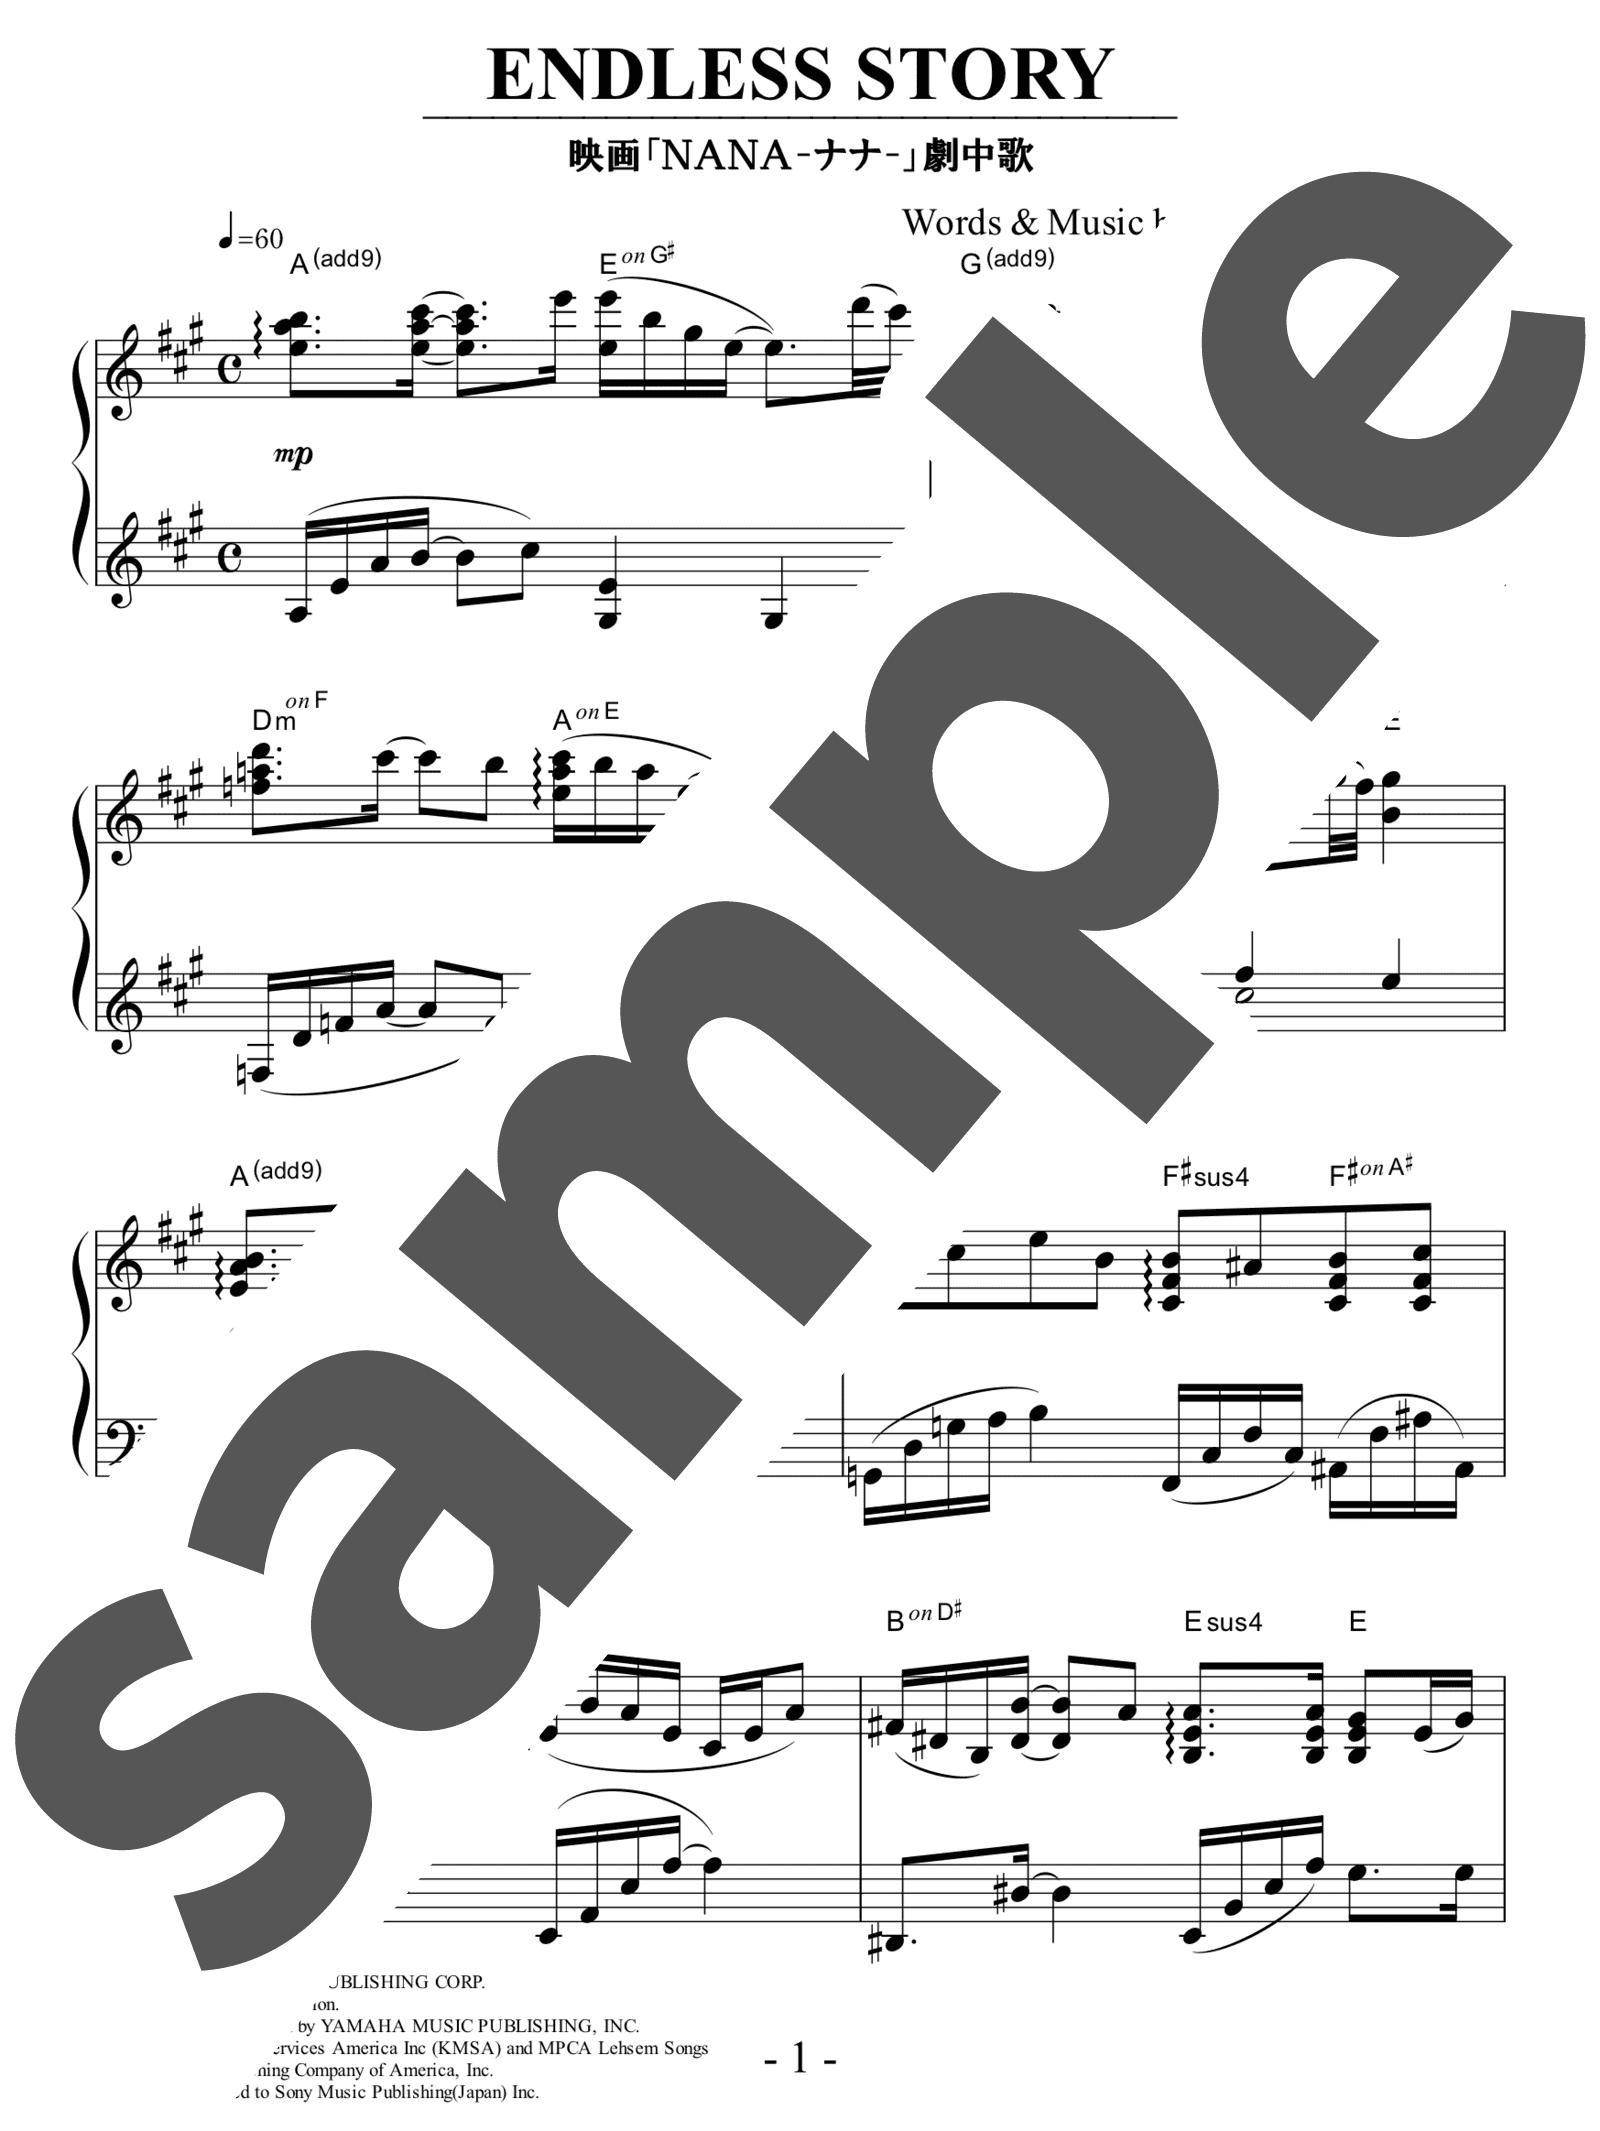 「ENDLESS STORY」のサンプル楽譜